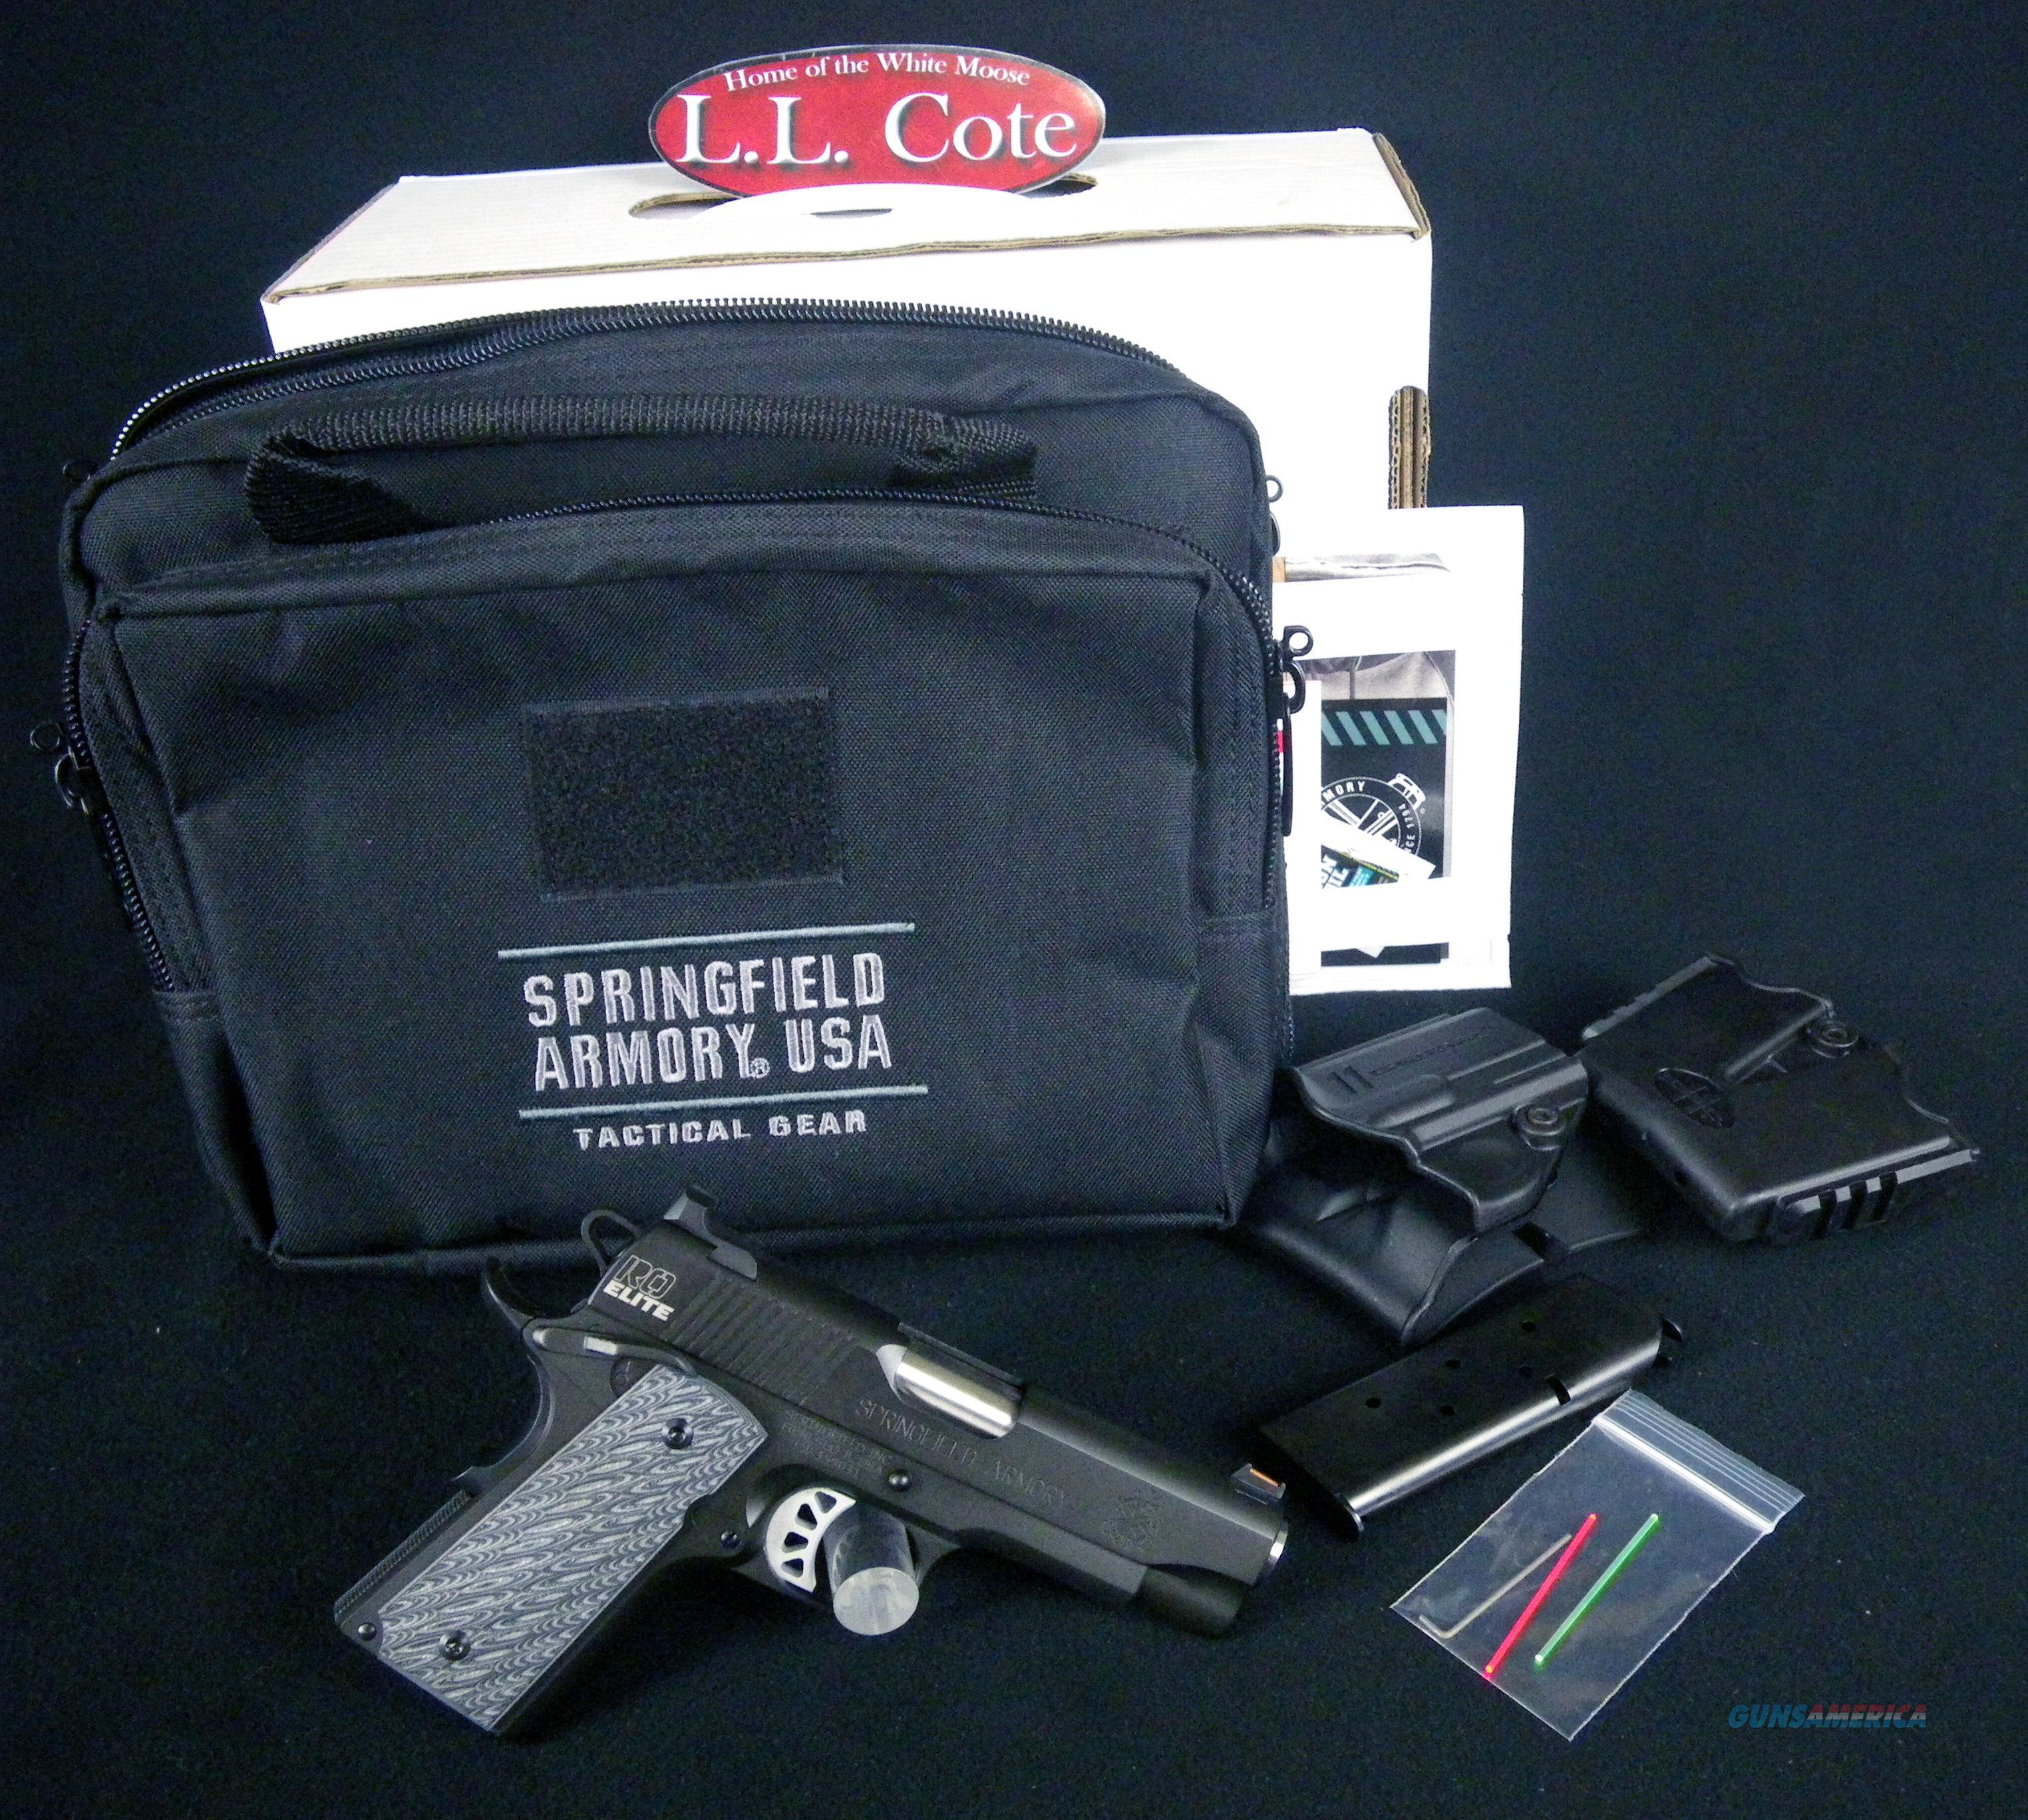 "Springfield 1911 Range Officer Elite 45ACP 4"" NEW P19126ER  Guns > Pistols > Springfield Armory Pistols > 1911 Type"